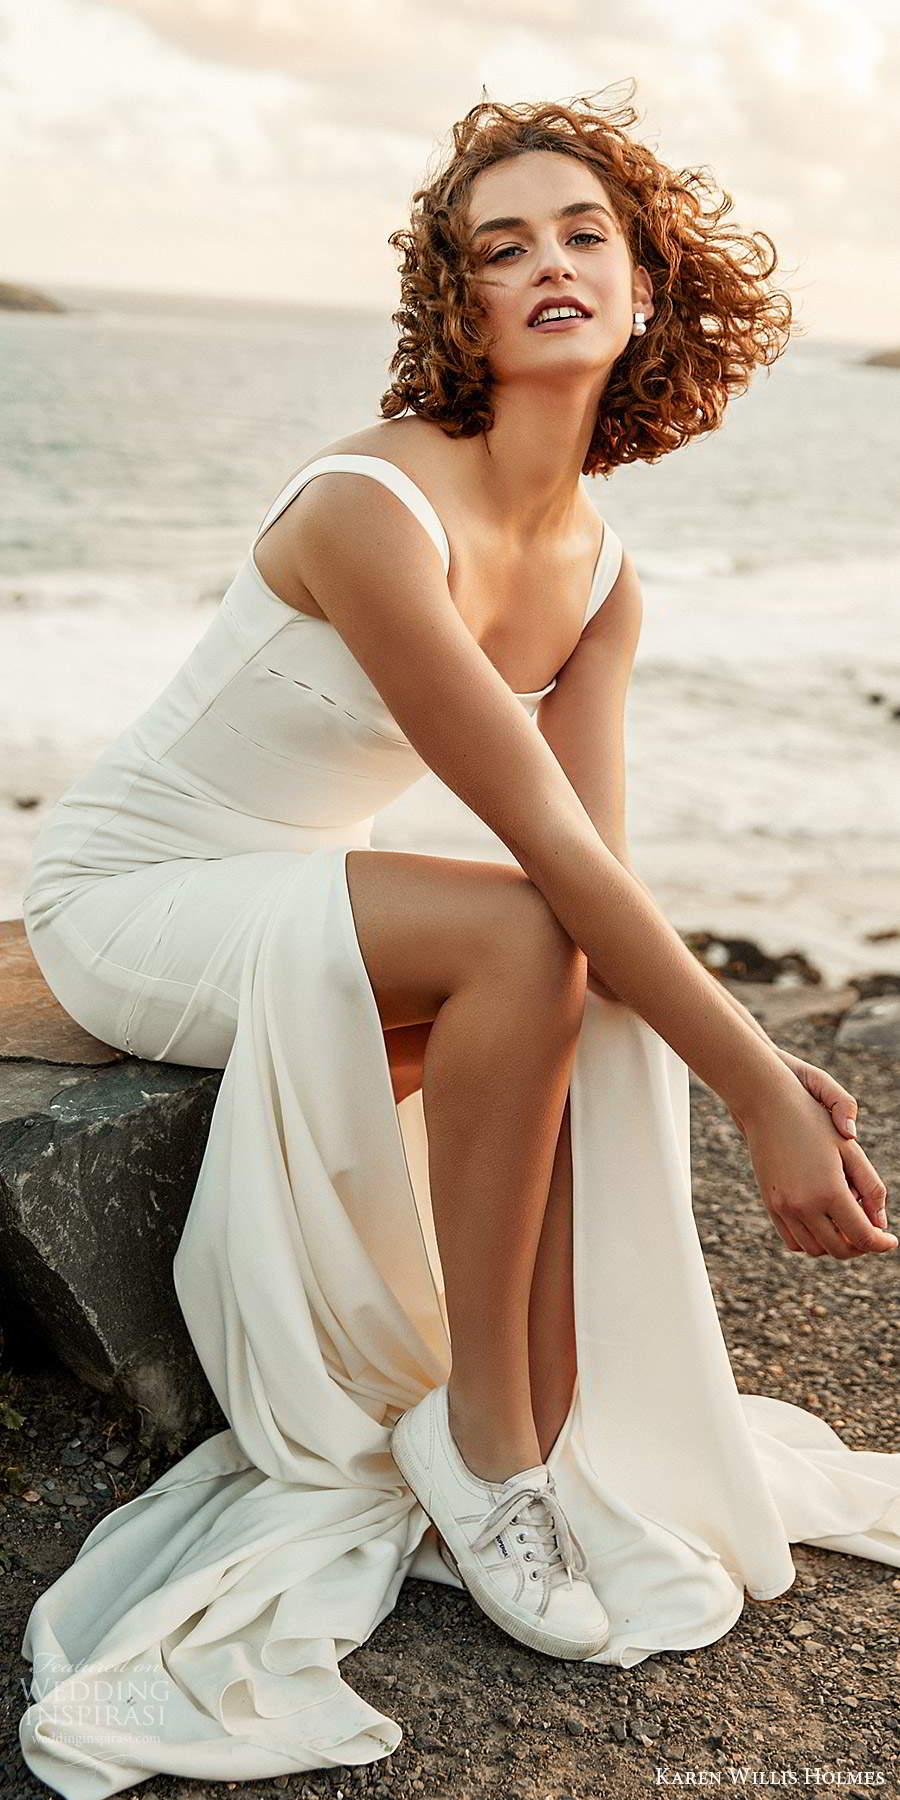 karen willis holmes 2020 bridal sleeveless thick straps straight across neckline clean minimally embellished fit flare mermaid wedding dress slit skirt sweep train (5) zv